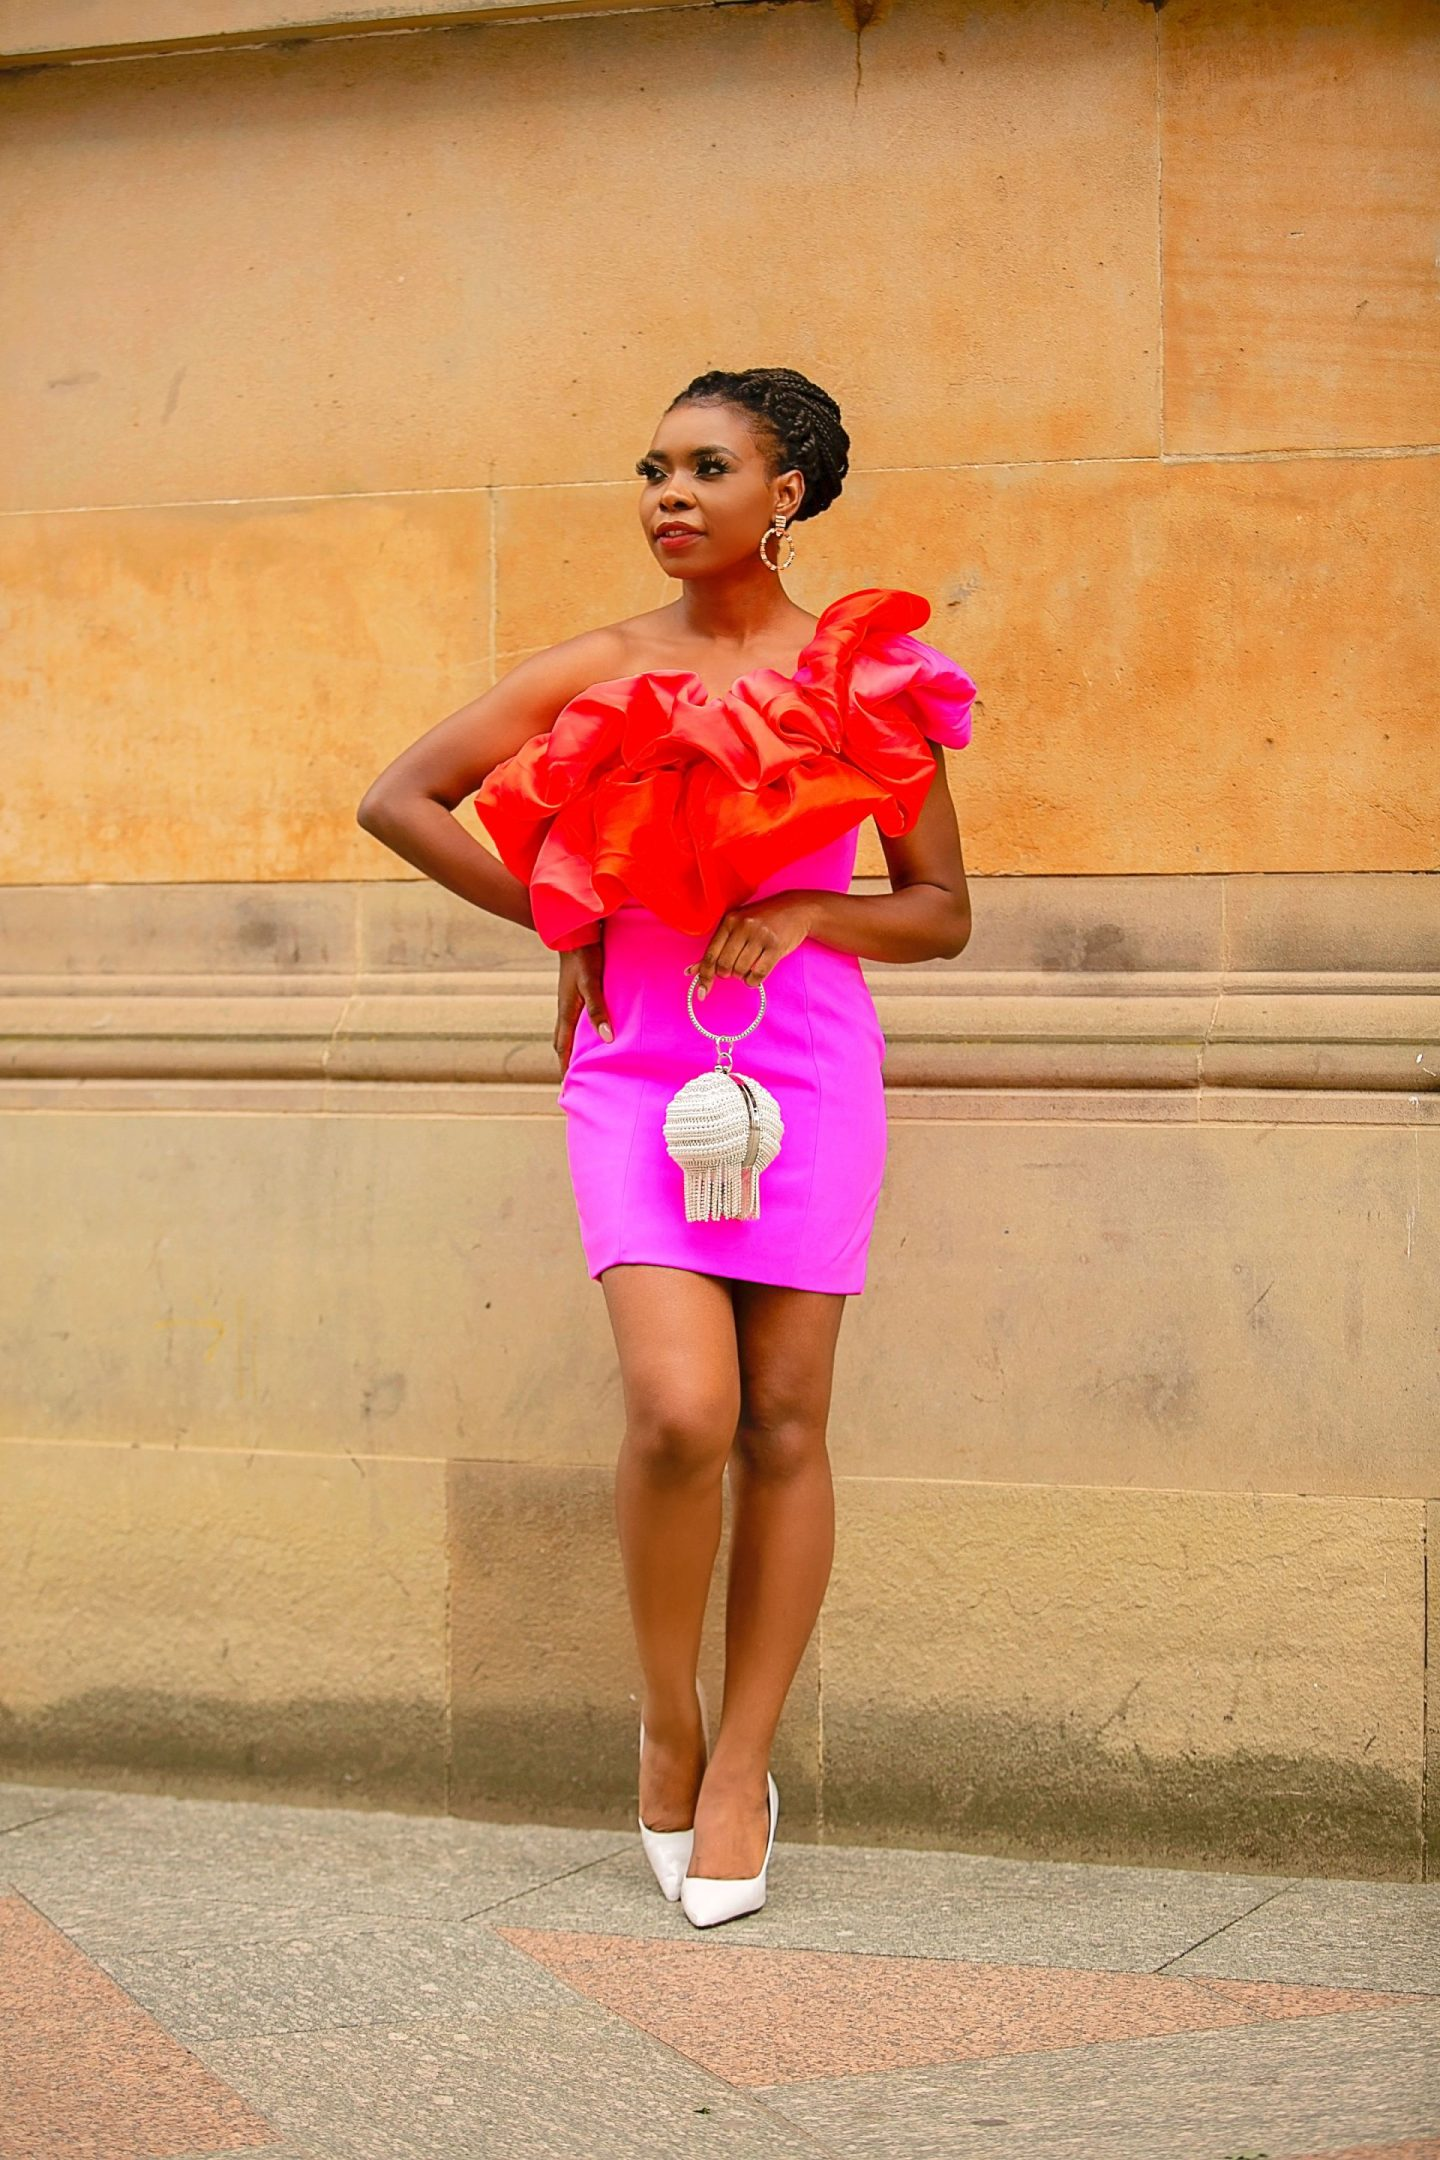 A Pink & Ombre Dress